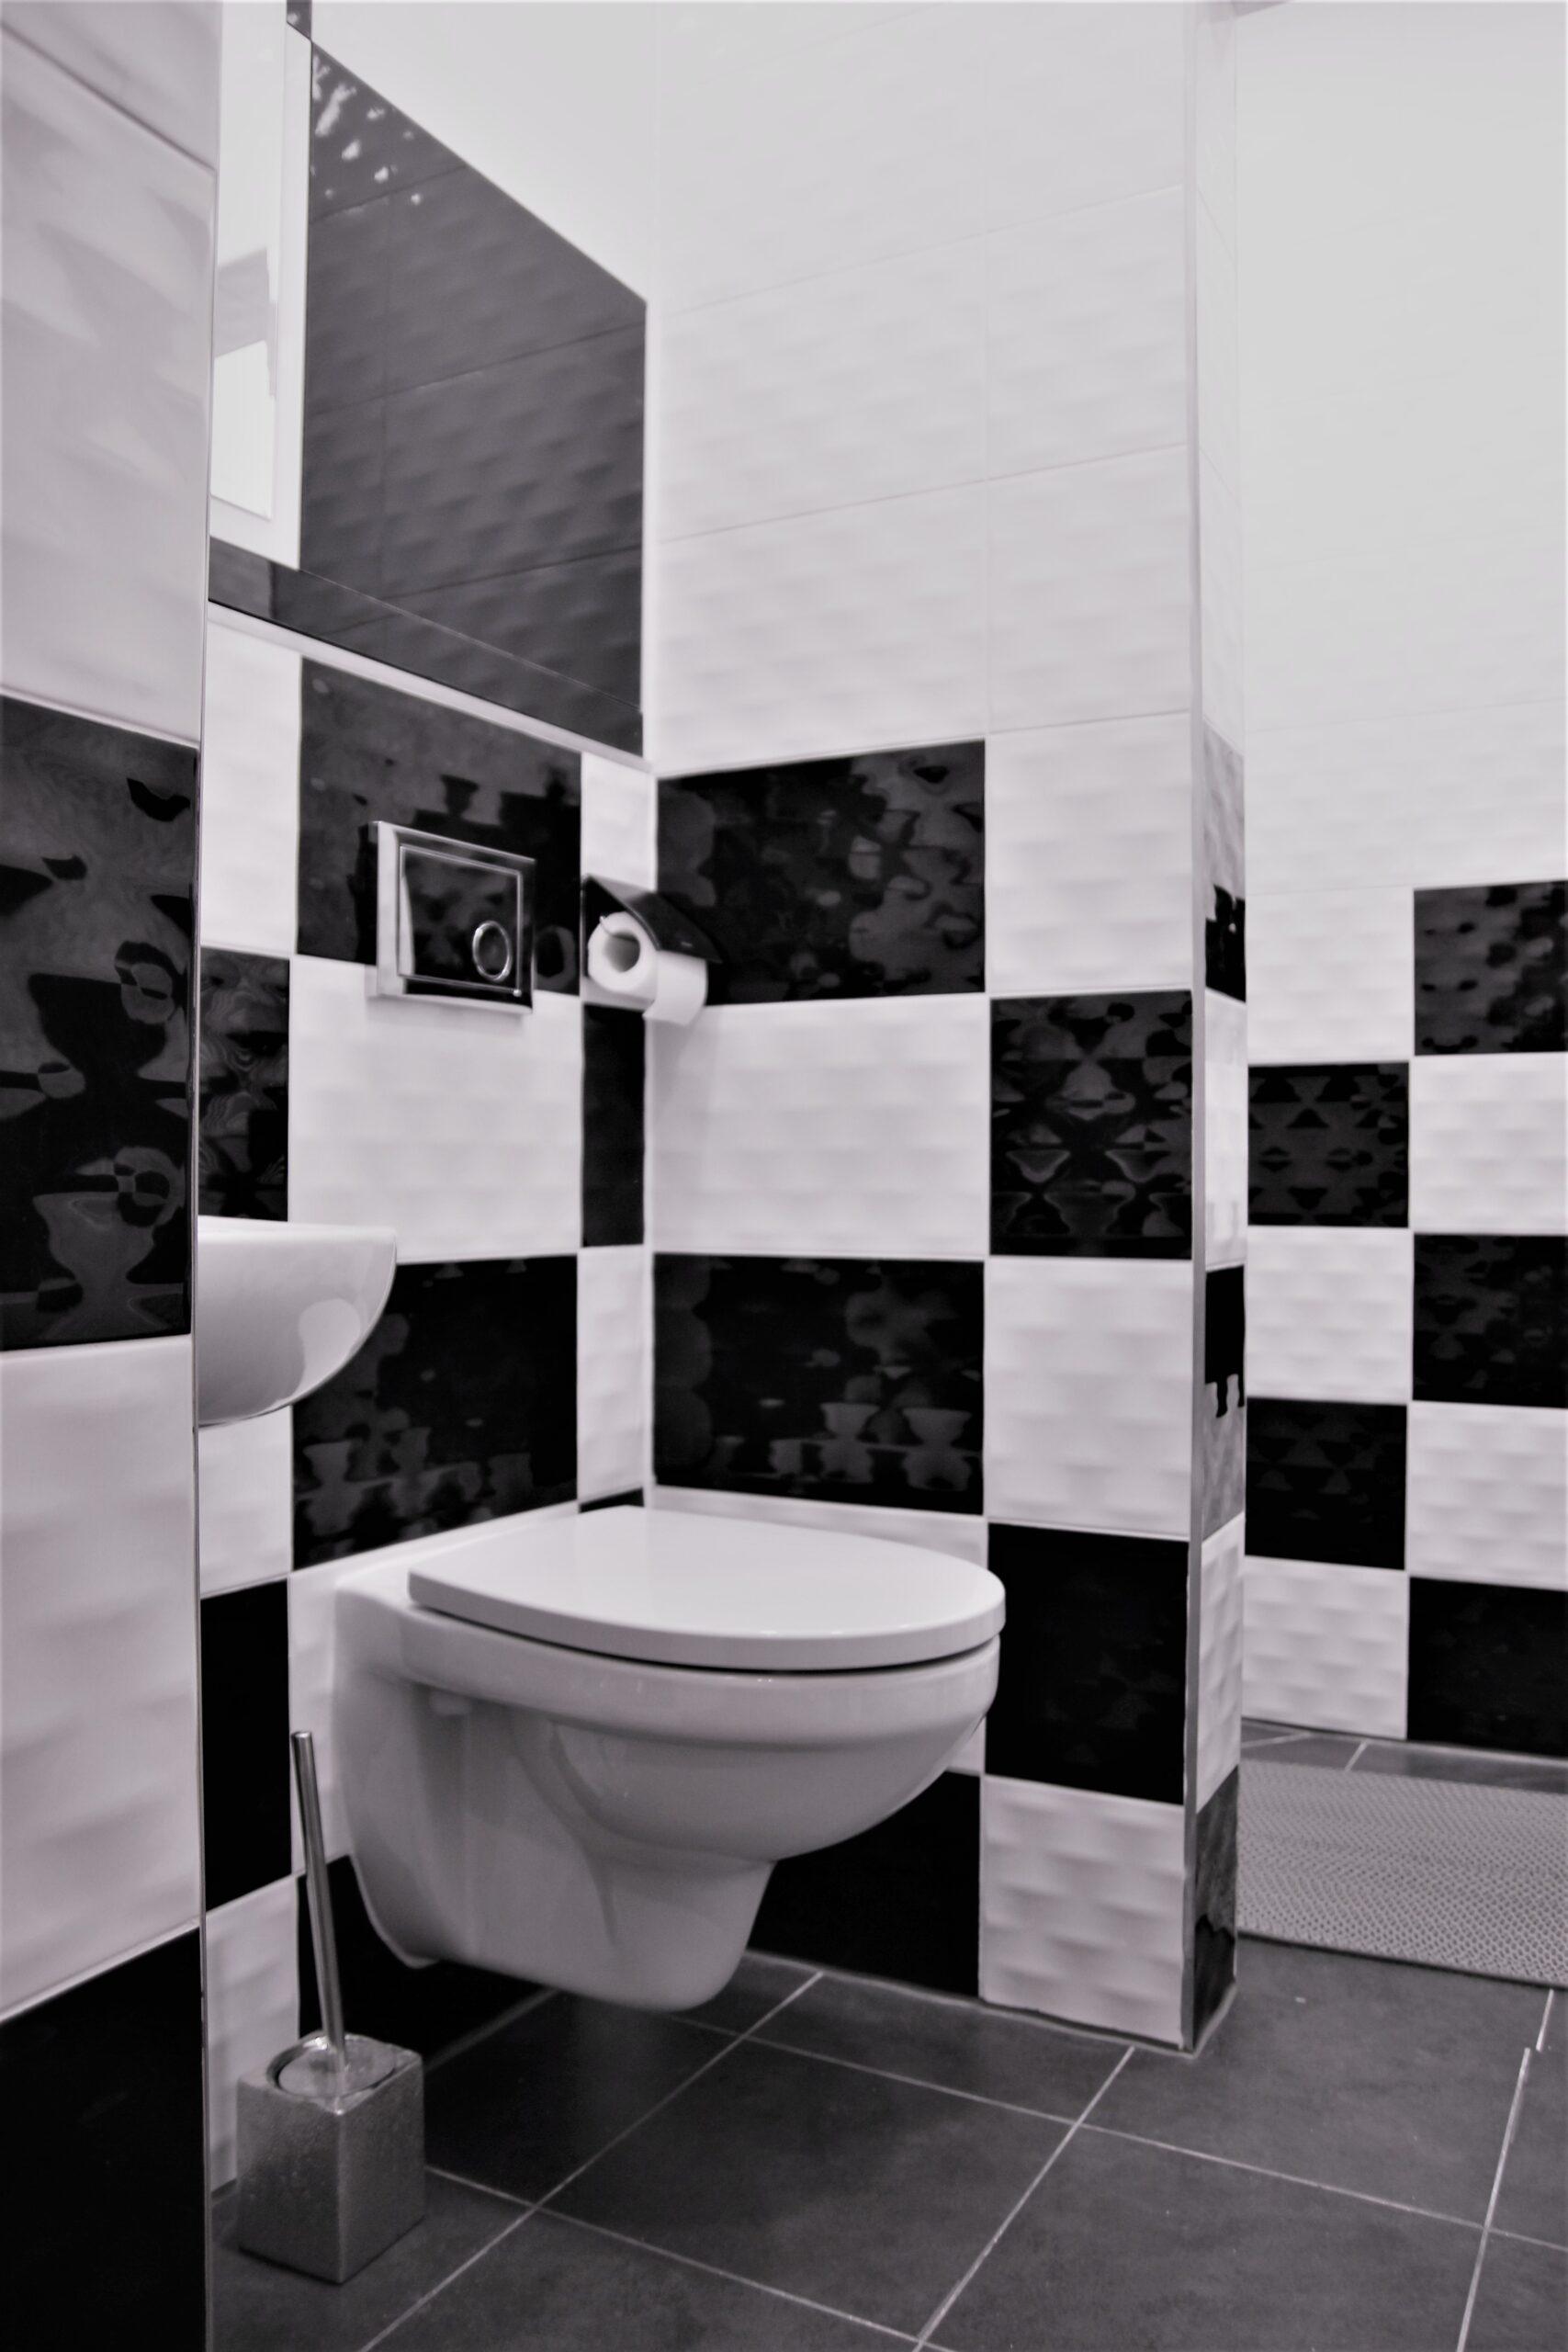 BLACK CHESS RESTROOM-Central hostel jelgava-Hostelis Jelgava-naktsmītne Jelgavā-vannas istaba-tualete.3